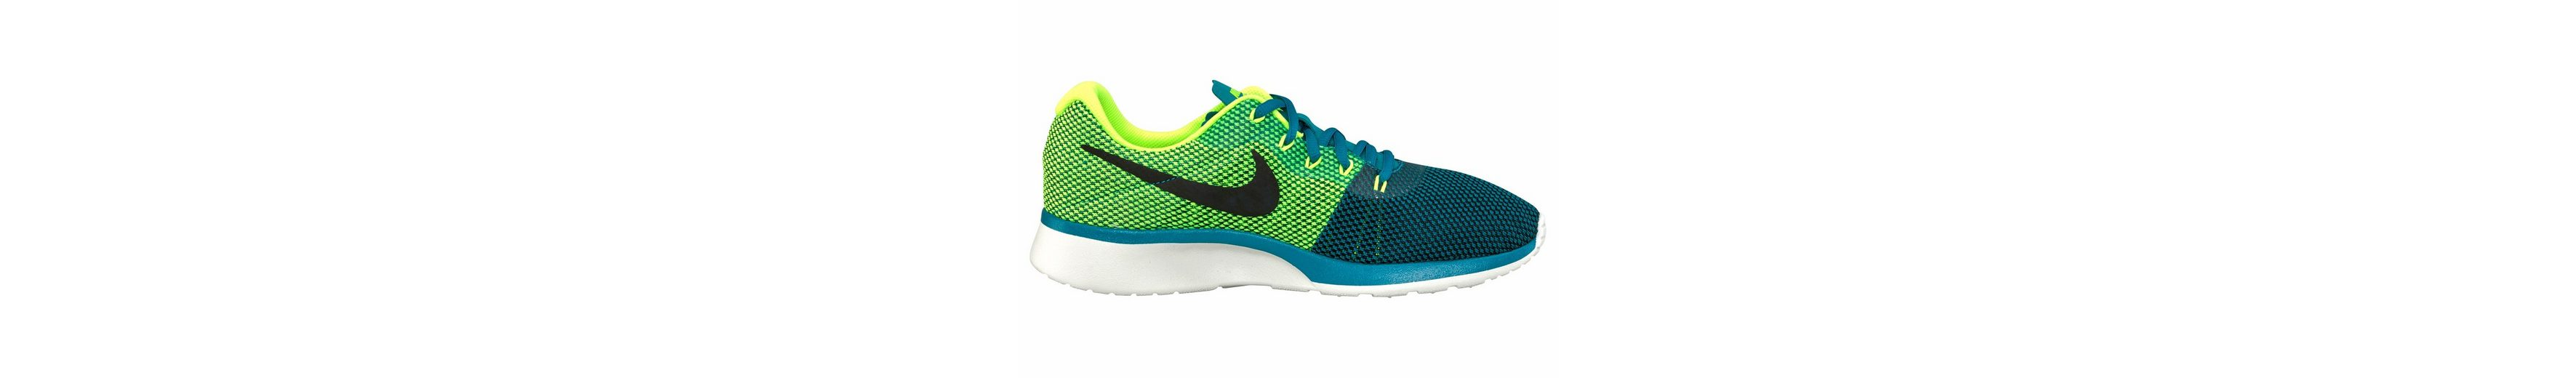 Nike Sportswear Tanjun Racer Sneaker Günstig Kaufen Niedrigen Preis Versandkosten Für 2rBaJM5